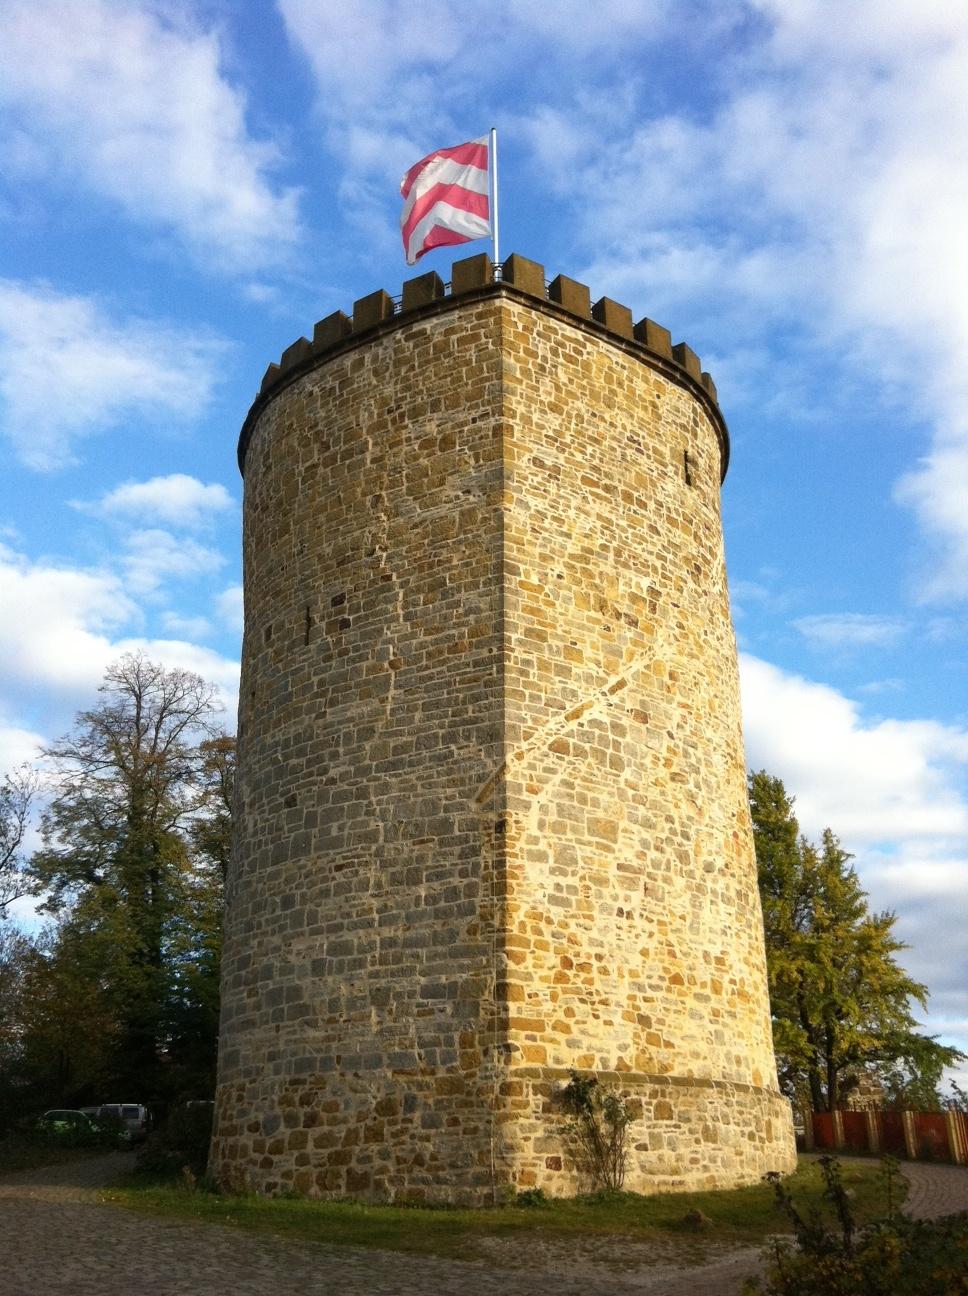 Stadt_Borgholzhausen_Turm_mit neuer Fahne.JPG